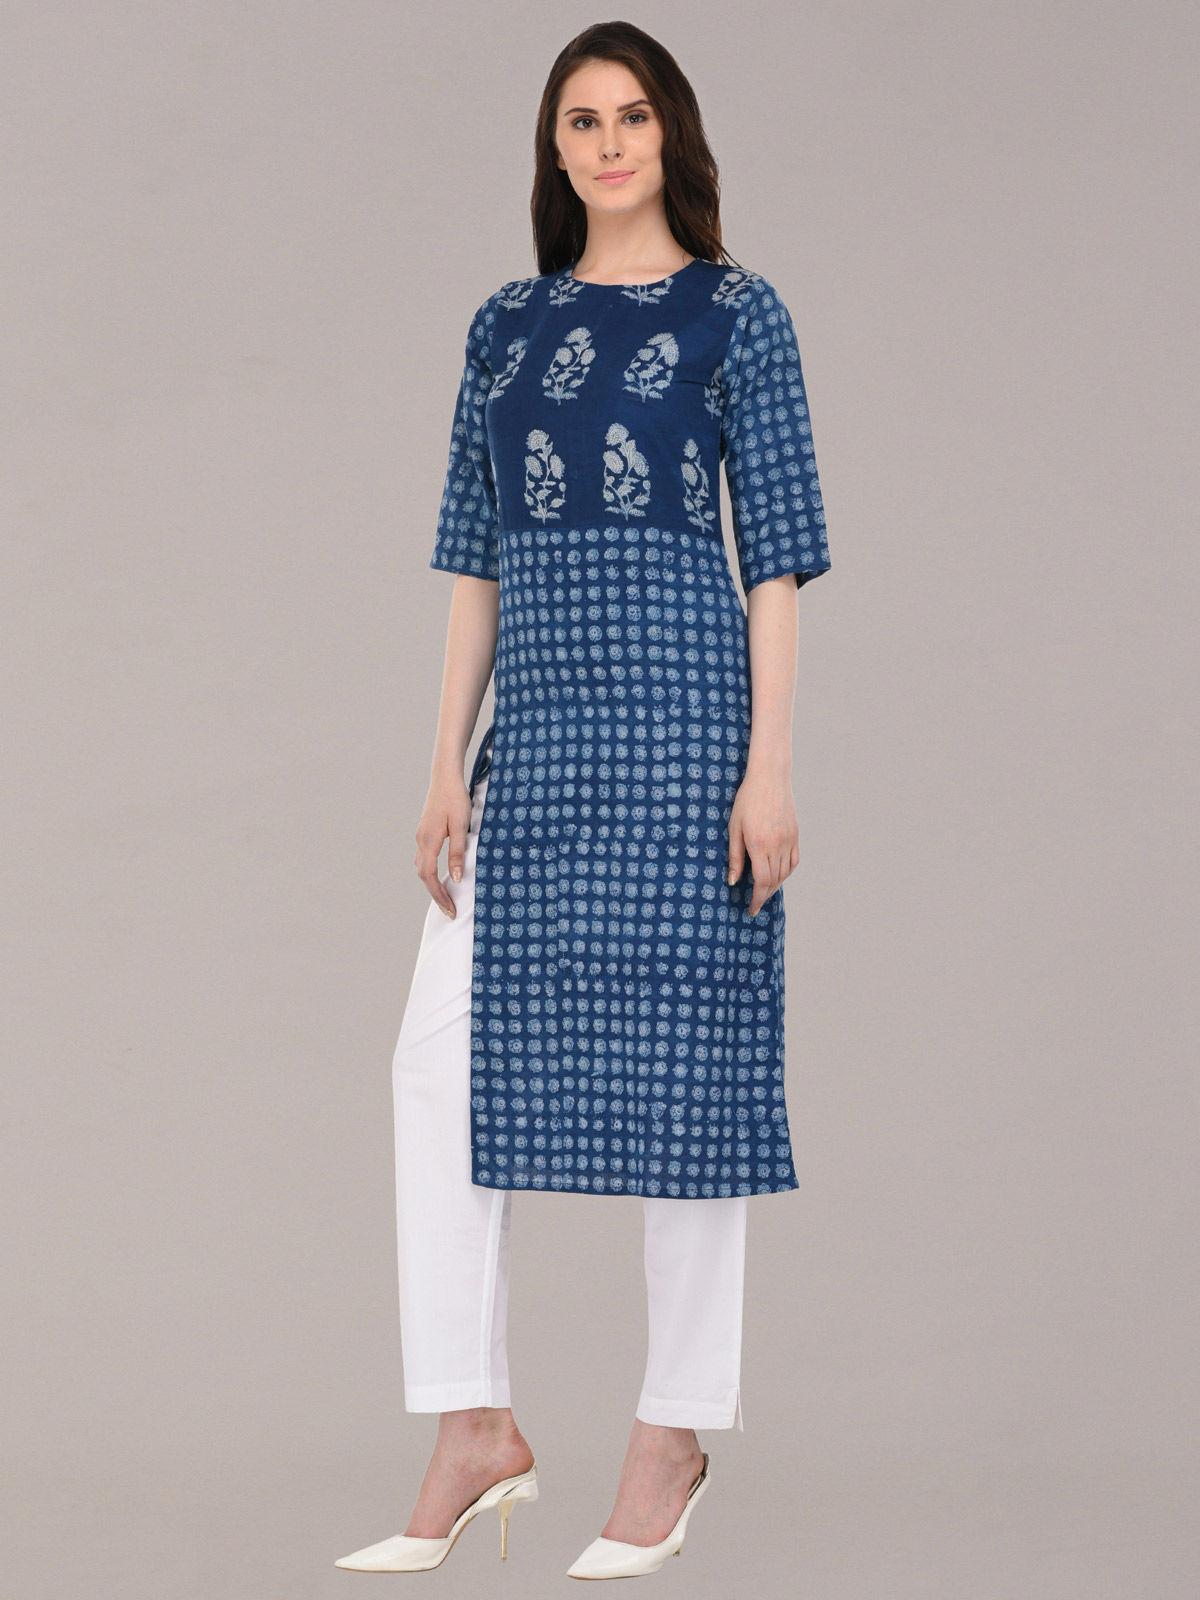 Azure indigo color hand-block printed  cotton kurti